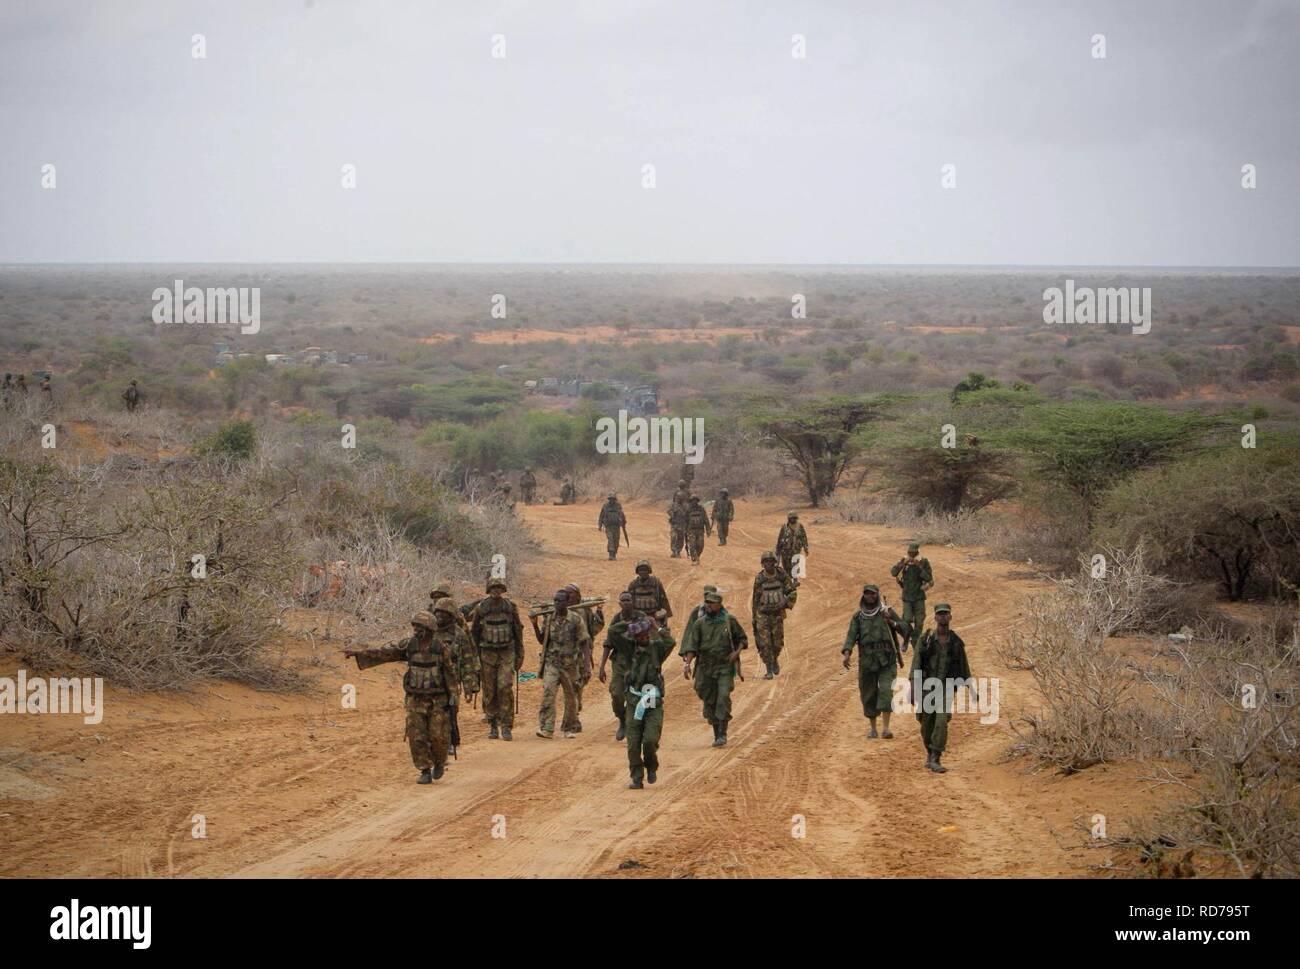 Kismayo Stock Photos & Kismayo Stock Images - Alamy